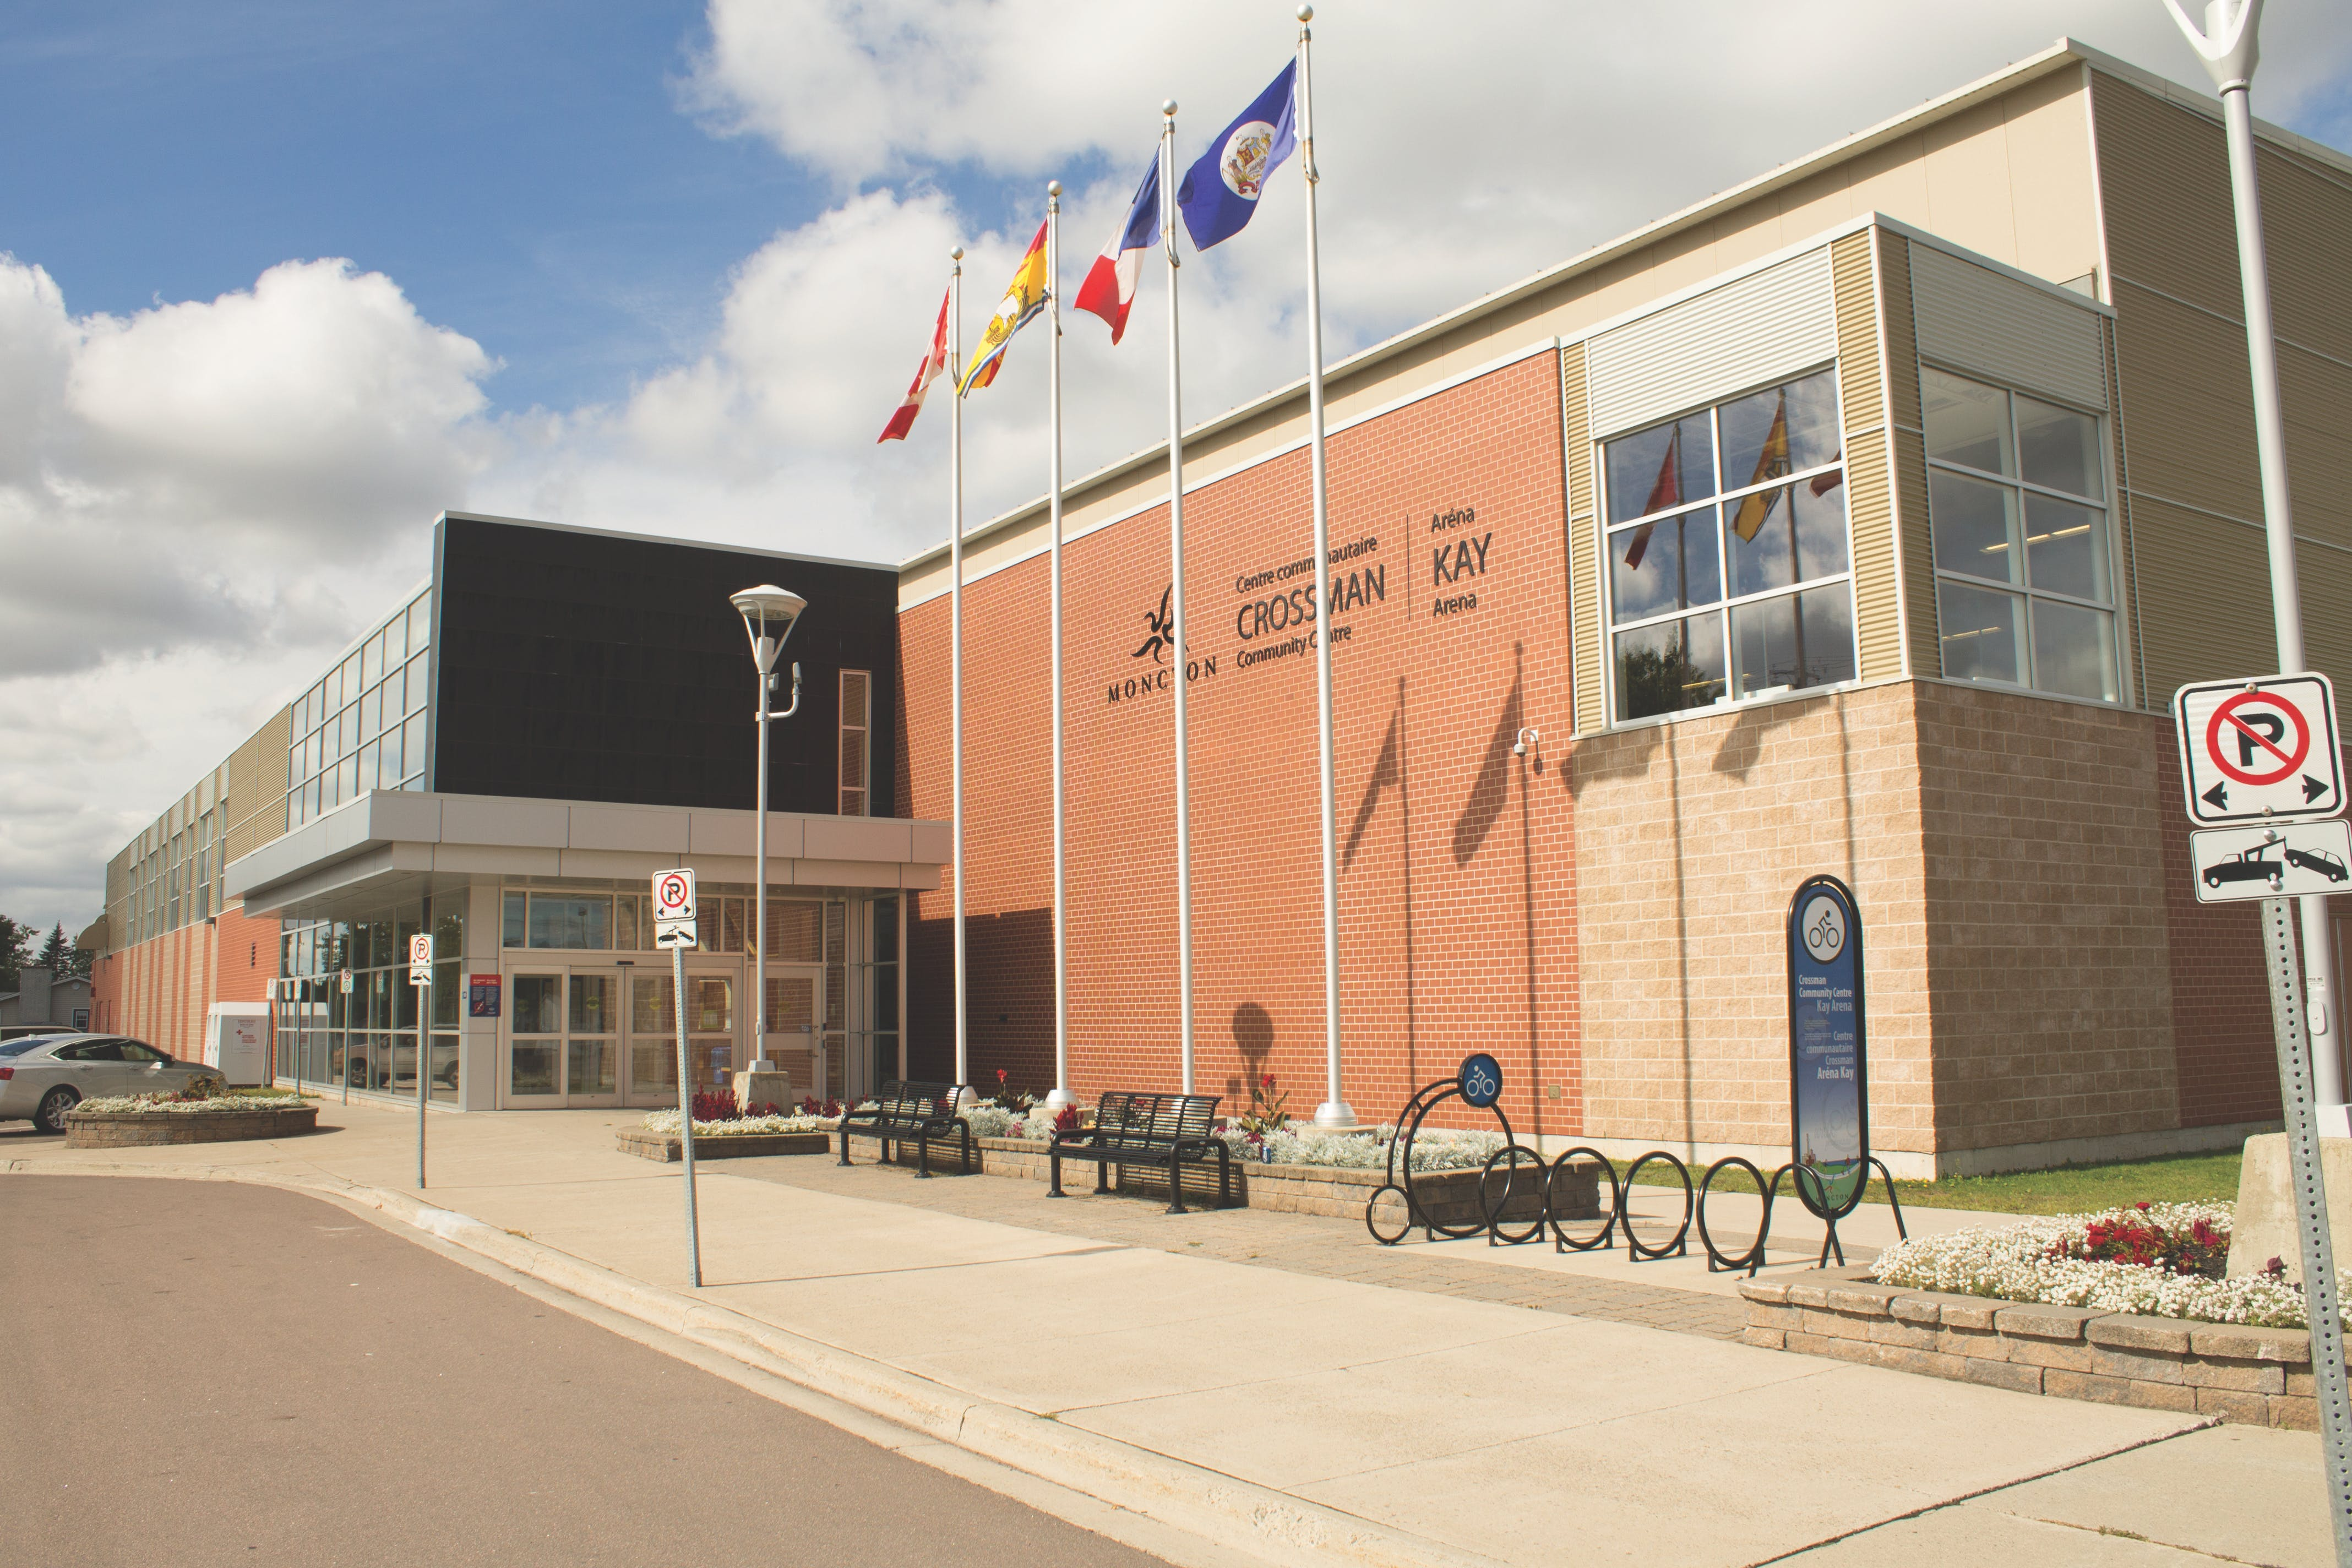 Crossman Community Centre - Kay Arena